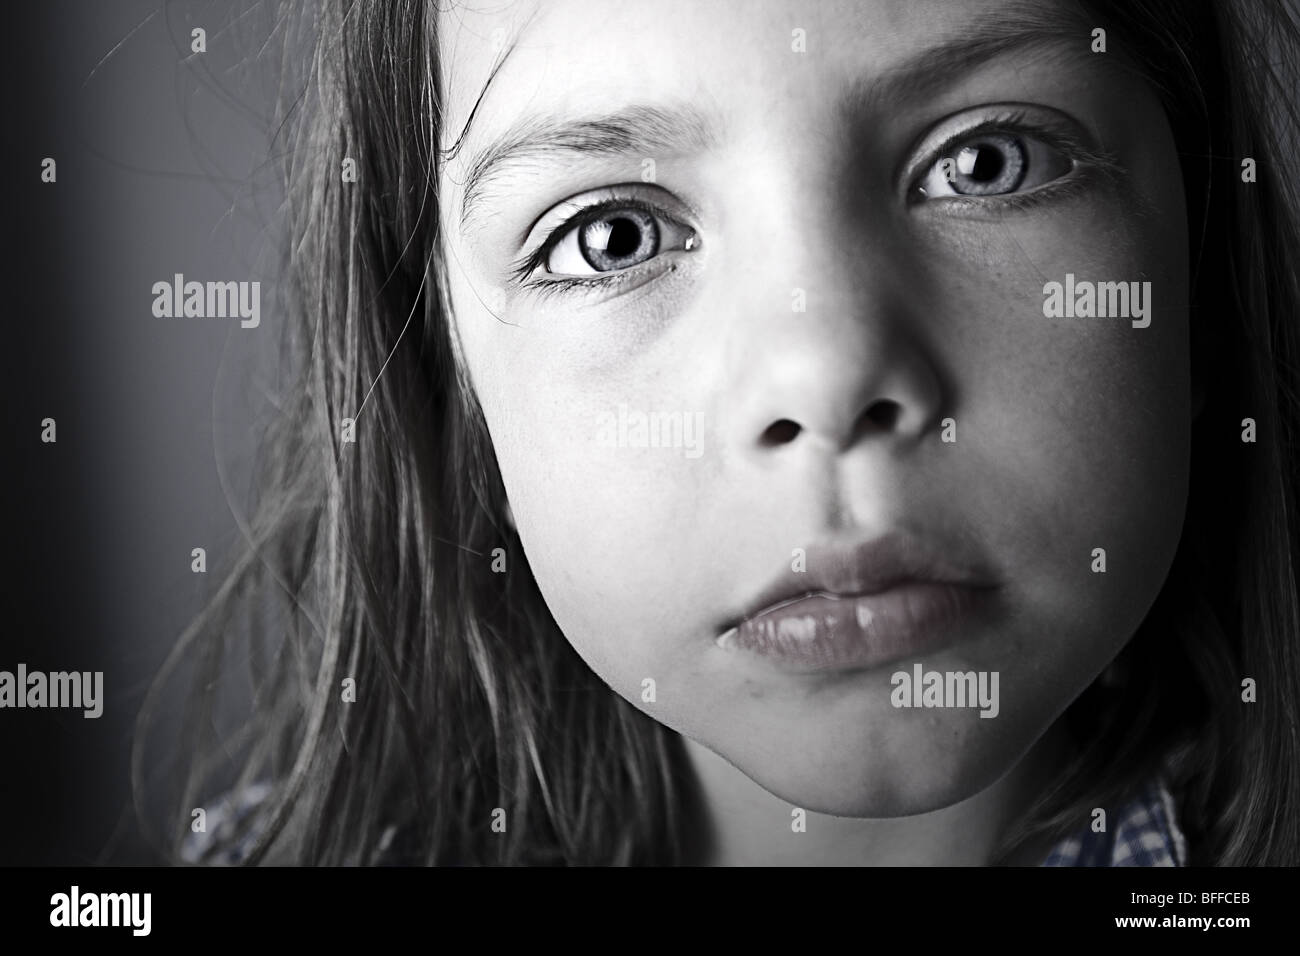 Close Up Shot of an Intense Child - Stock Image